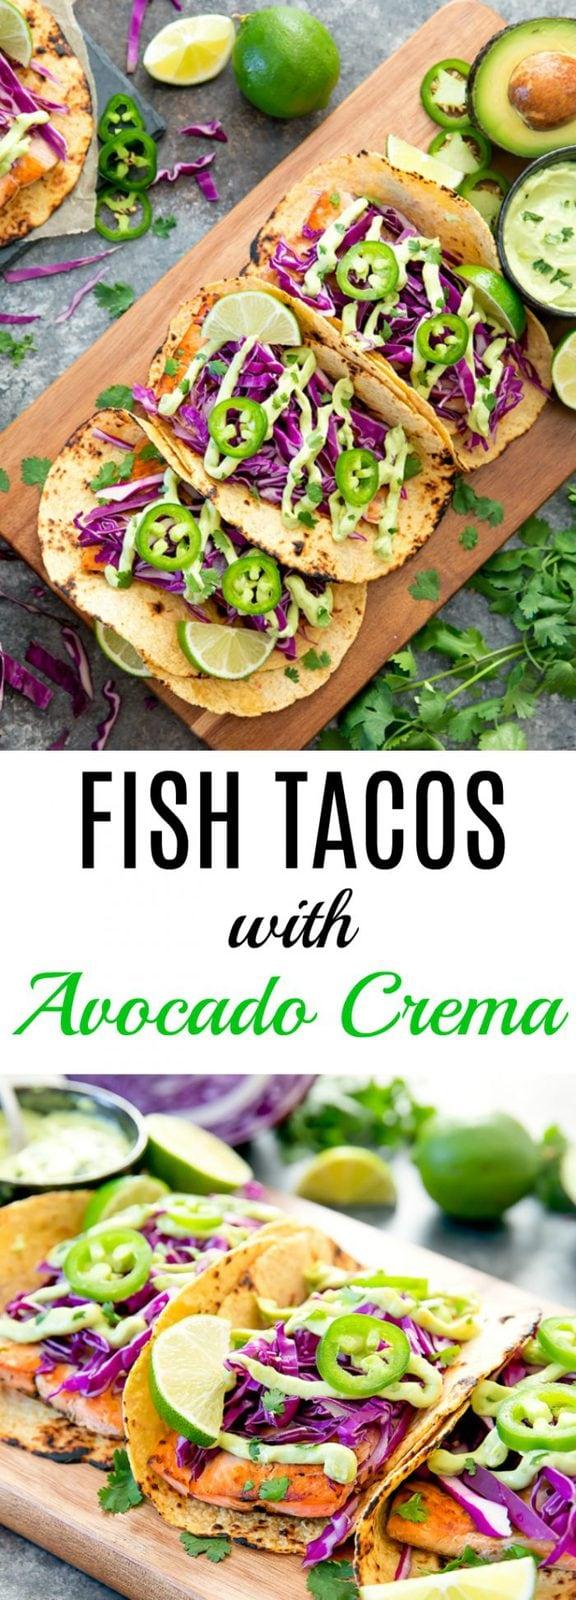 Salmon Fish Tacos with Avocado Crema Sauce